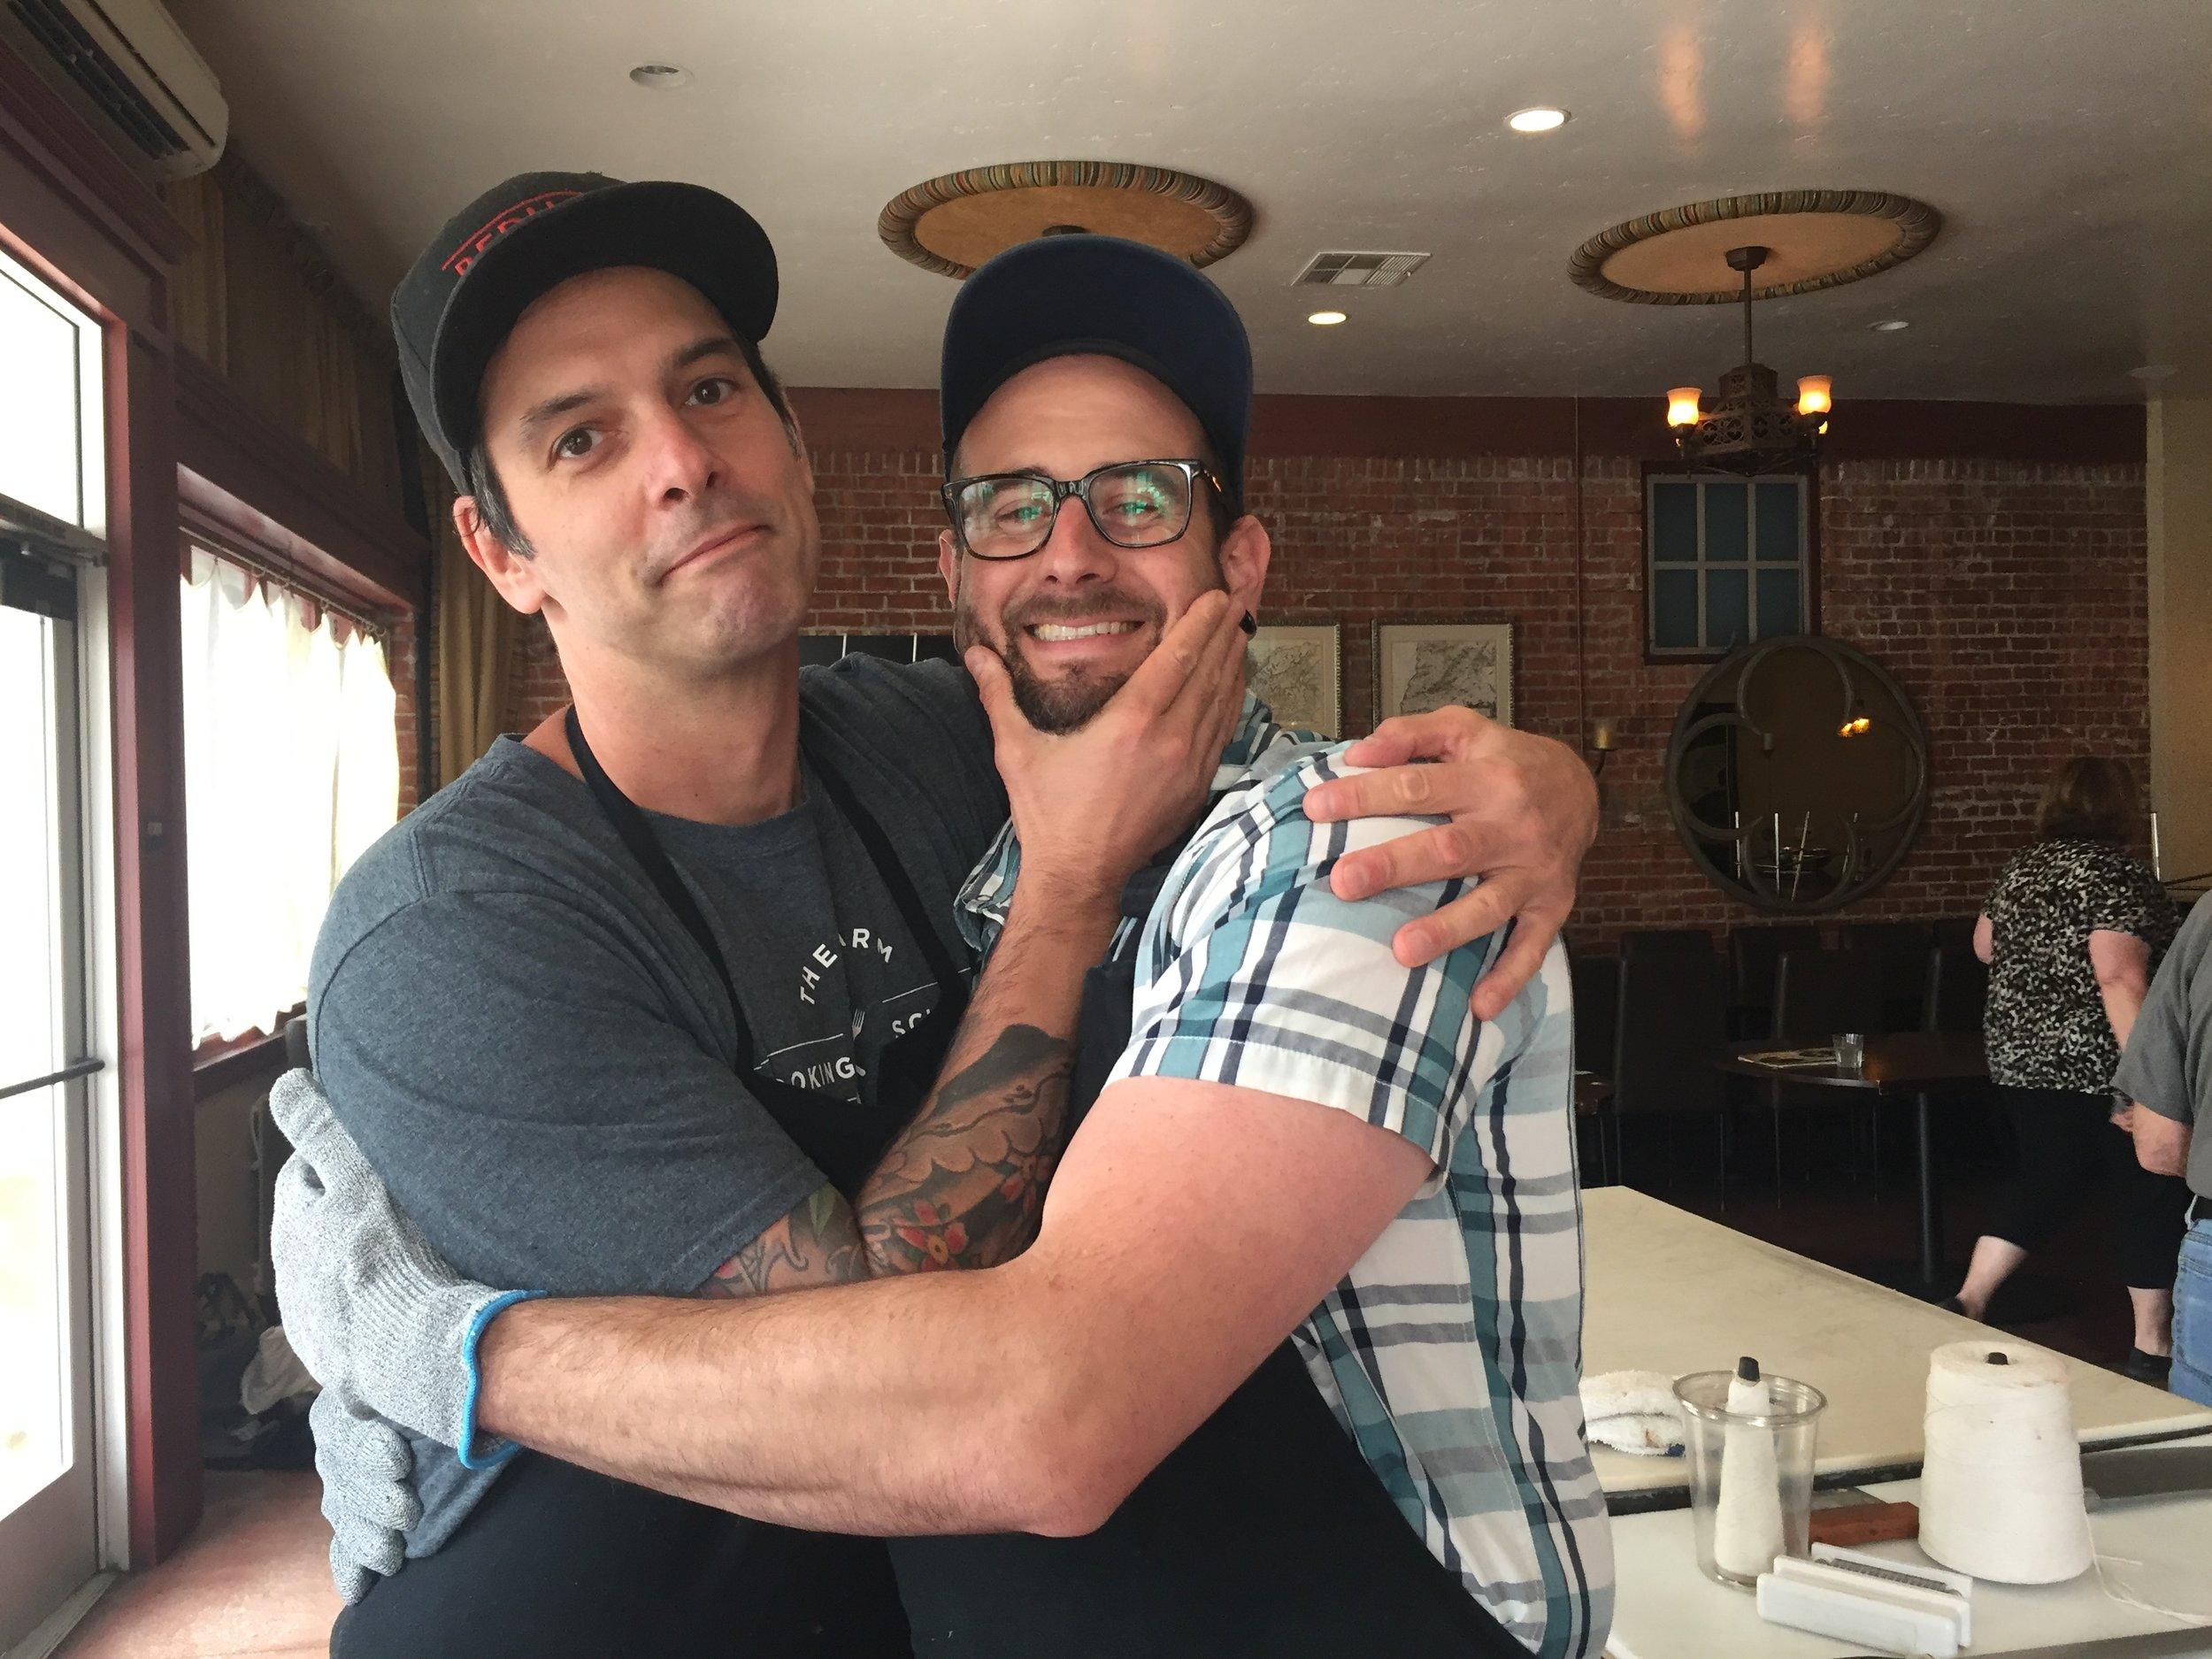 Bryan Mayer & Travis Stockstill @ The Butchers Guild Team USA 2020 Tryouts